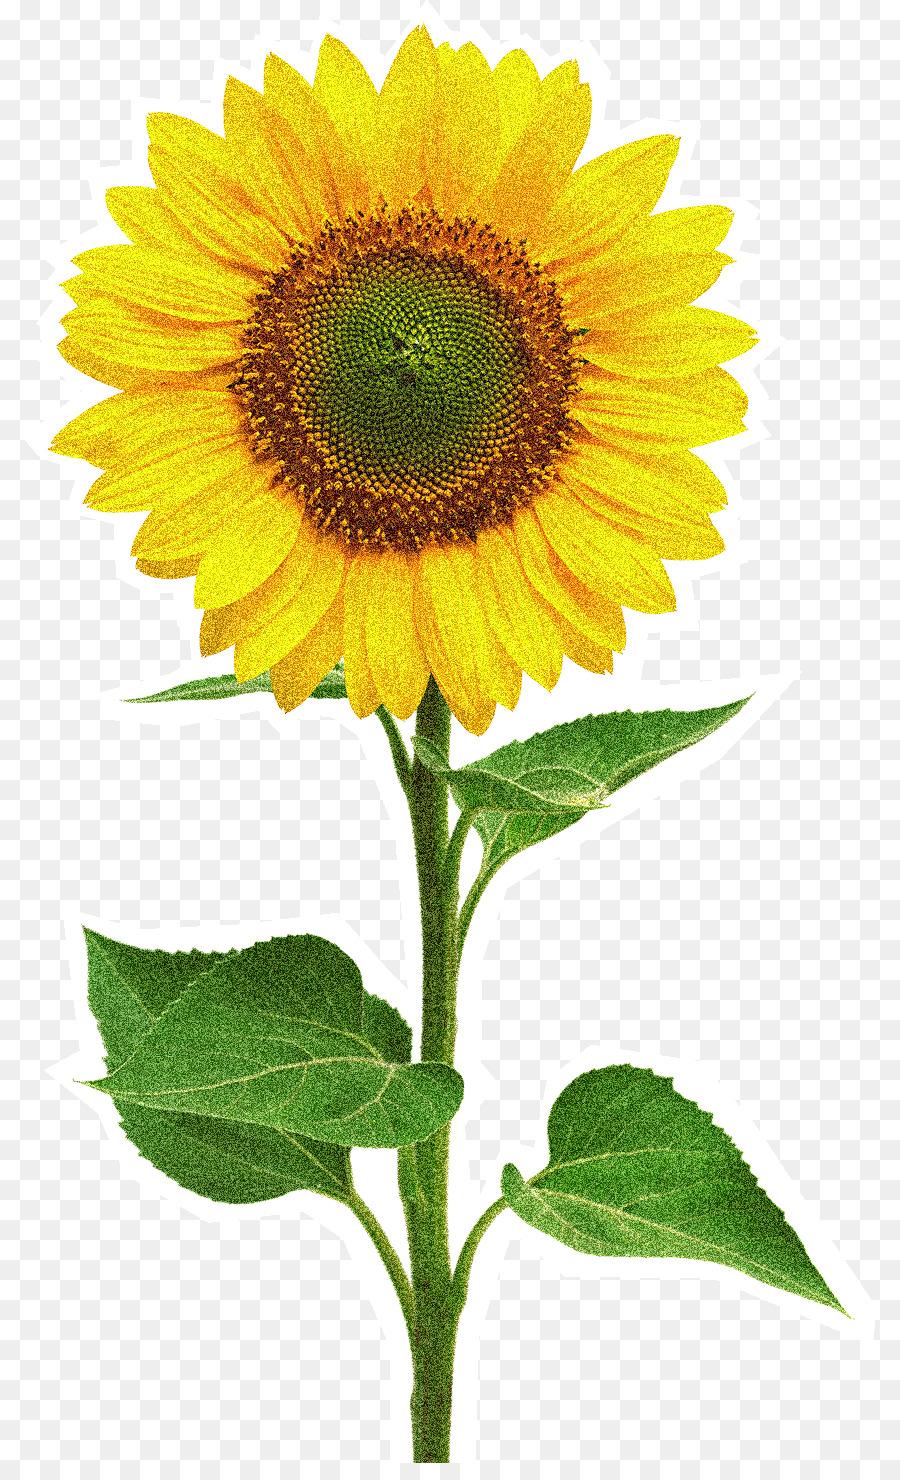 Sunflower stock clipart banner freeuse download Family Cartoon clipart - Flower, Sunflower, transparent clip art banner freeuse download